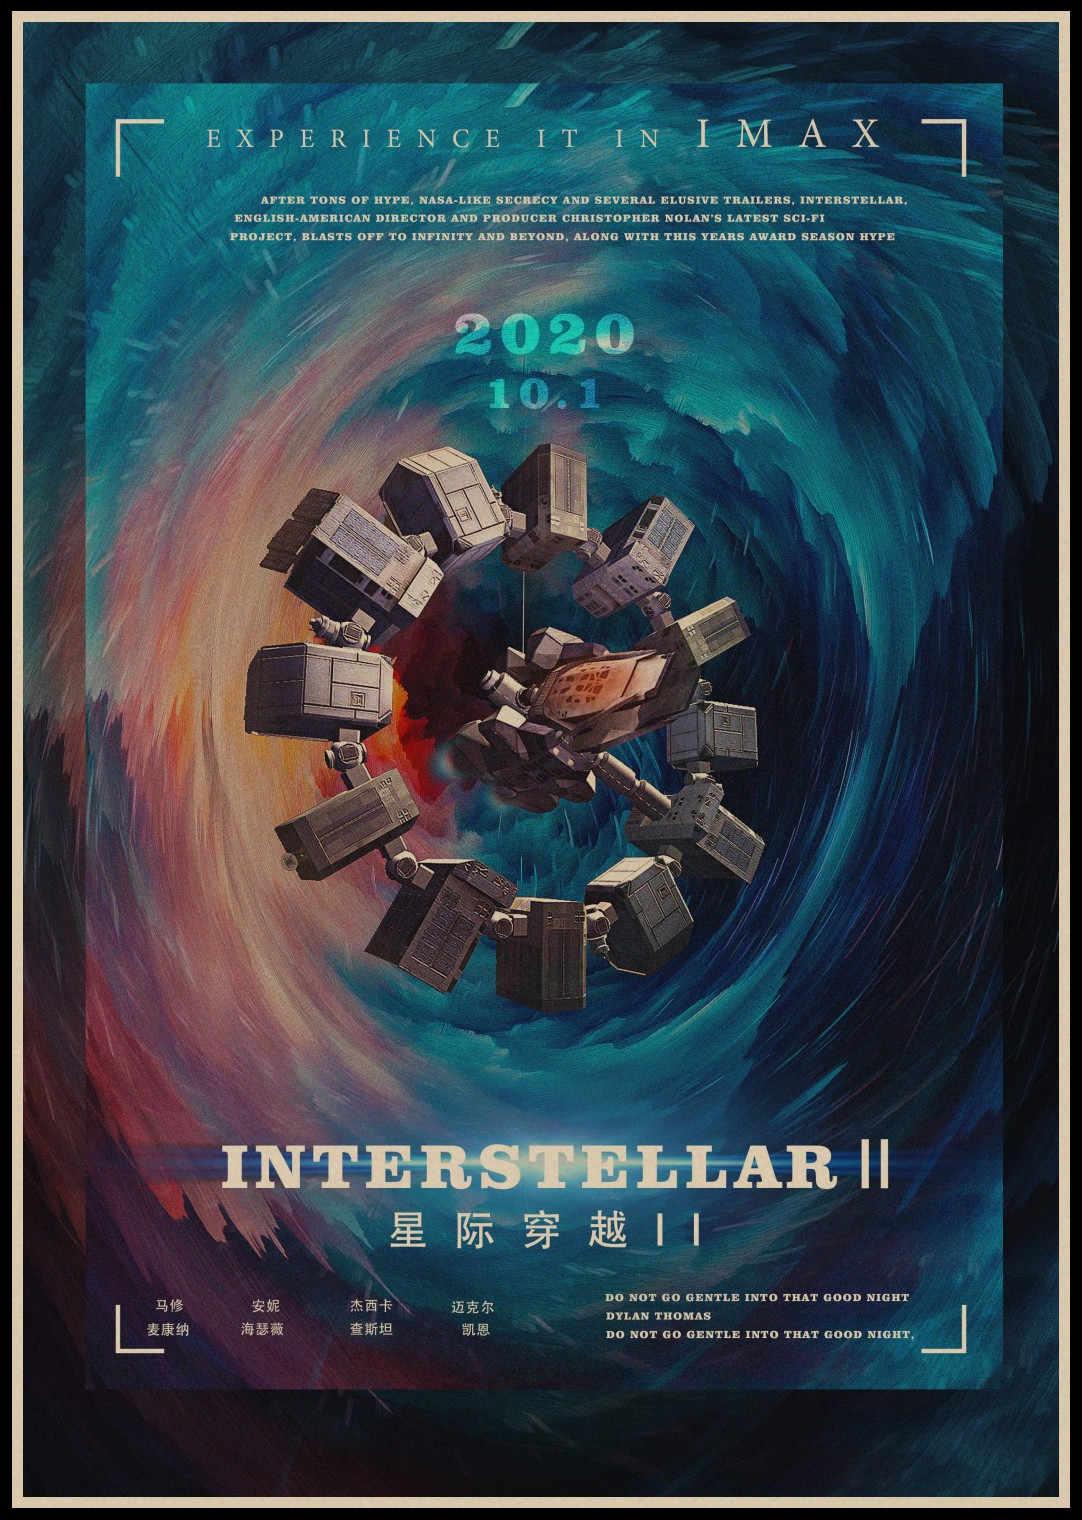 Interstellar Poster Retro Movie Kraft Paper Posters Decorative Painting Core Wallpaper Mural Stickers Wall Sticker Wall Decor A2 Aliexpress